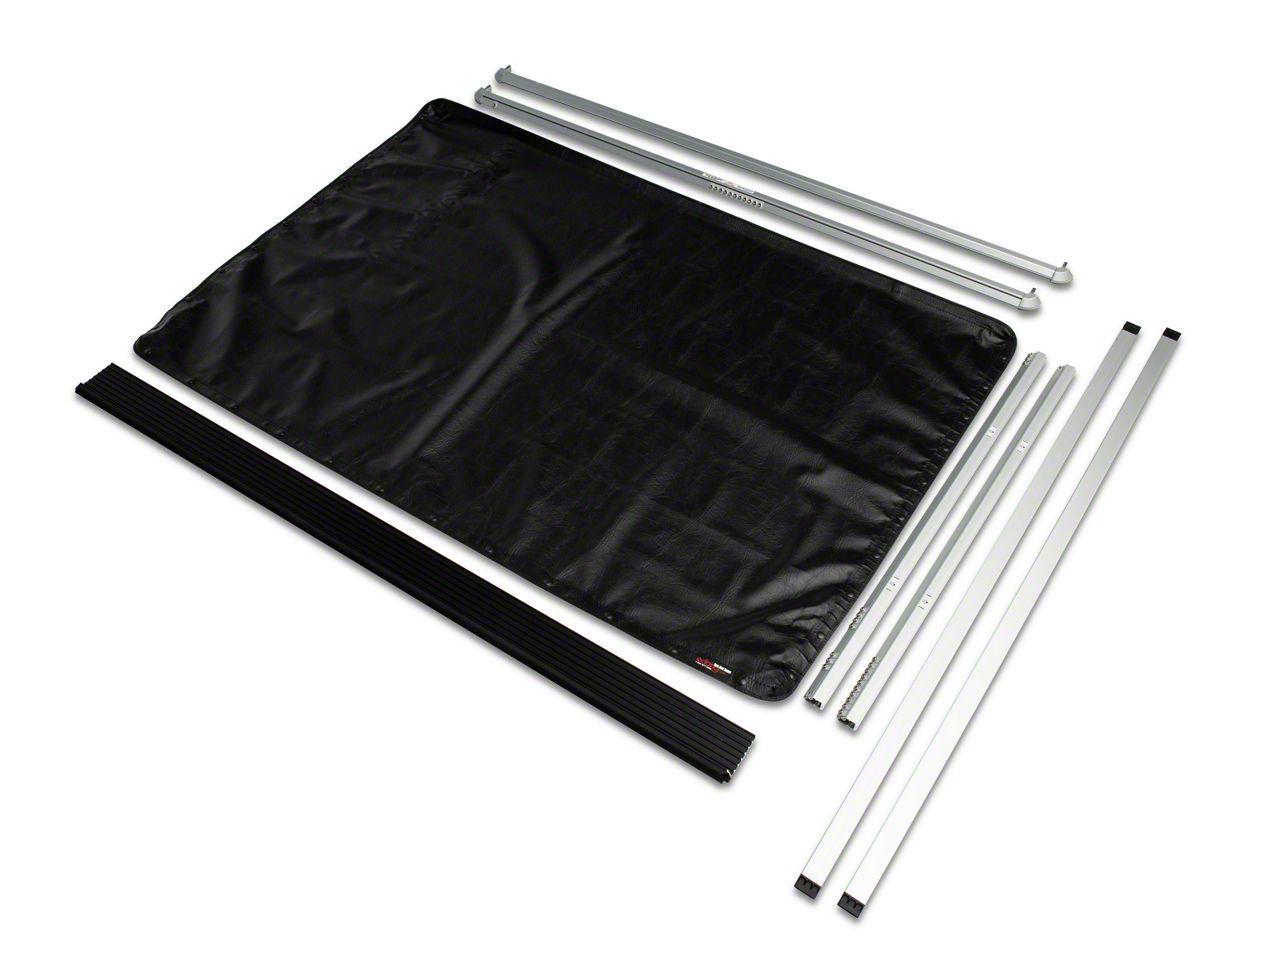 Extang Classic Platinum Toolbox Snap Tonneau Cover (09-18 RAM 1500 w/o RAM Box)